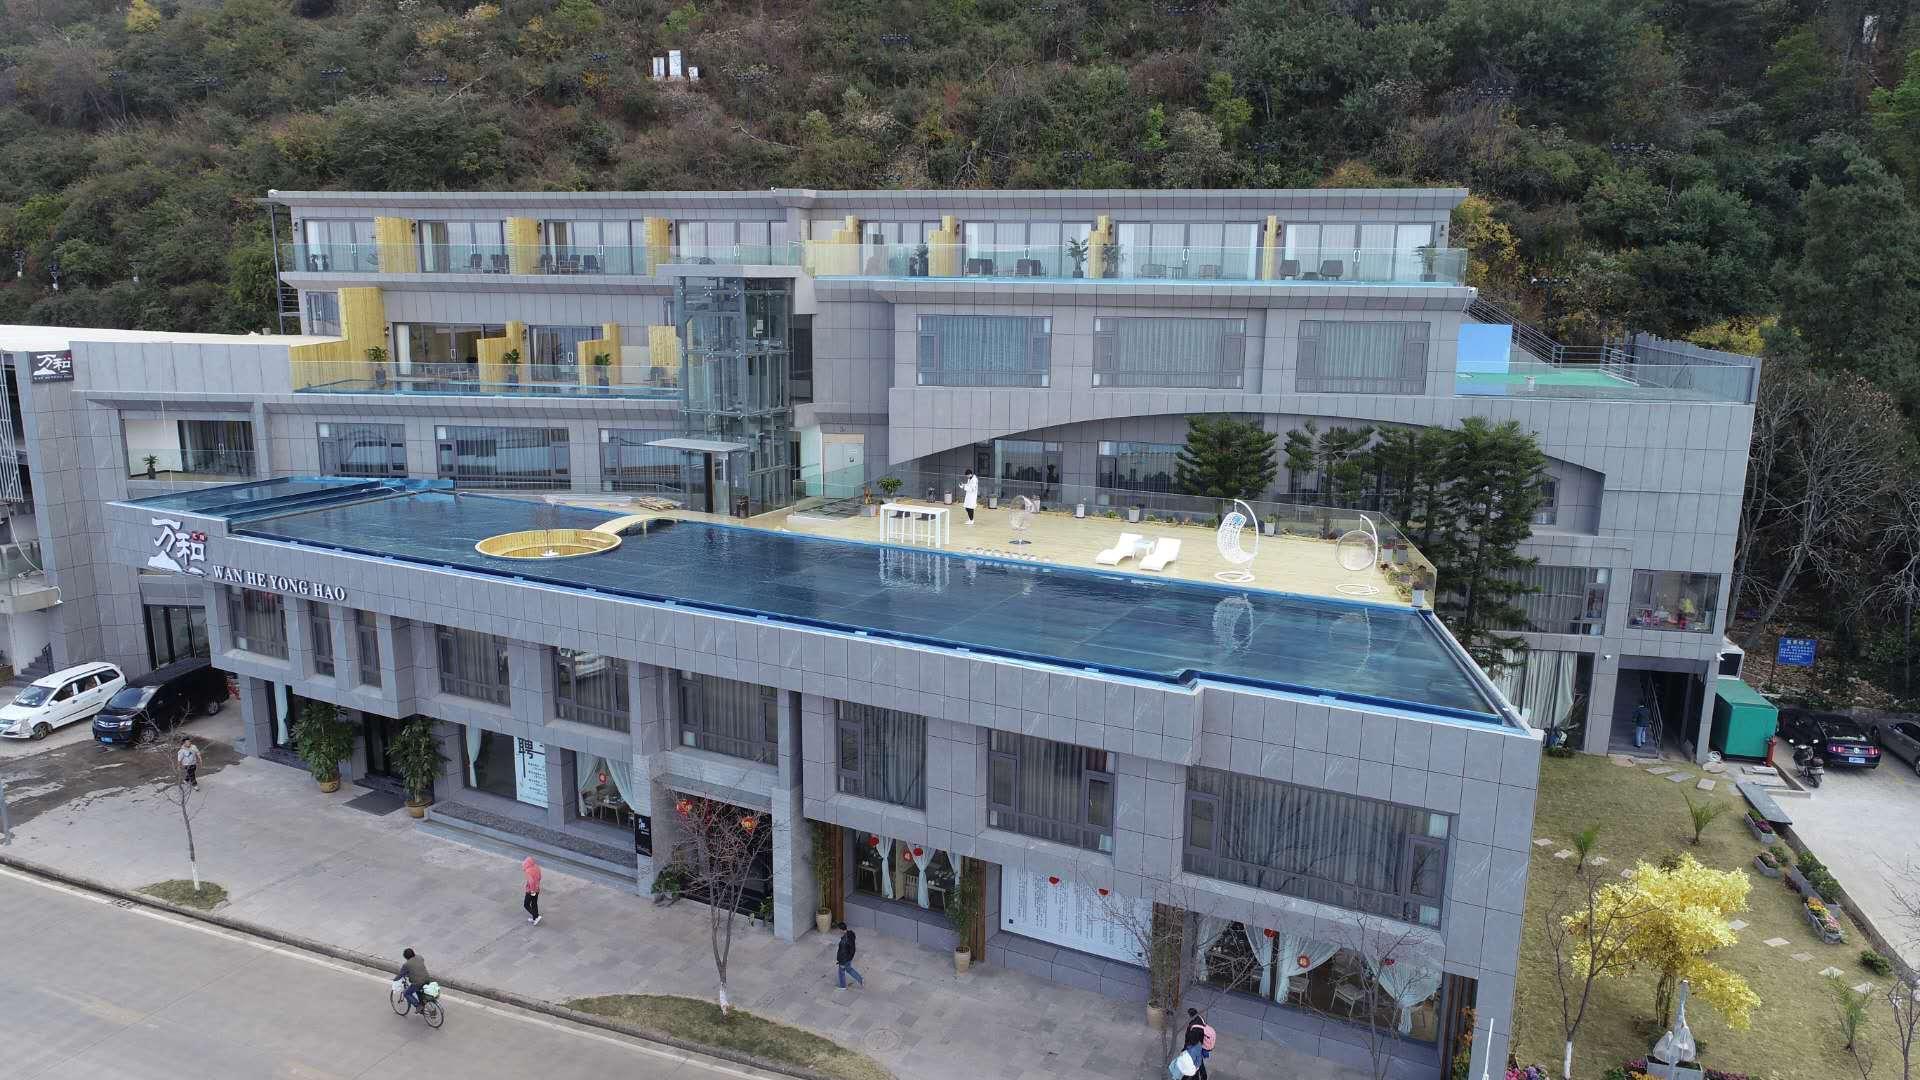 WanheYonghao, Dali Bai